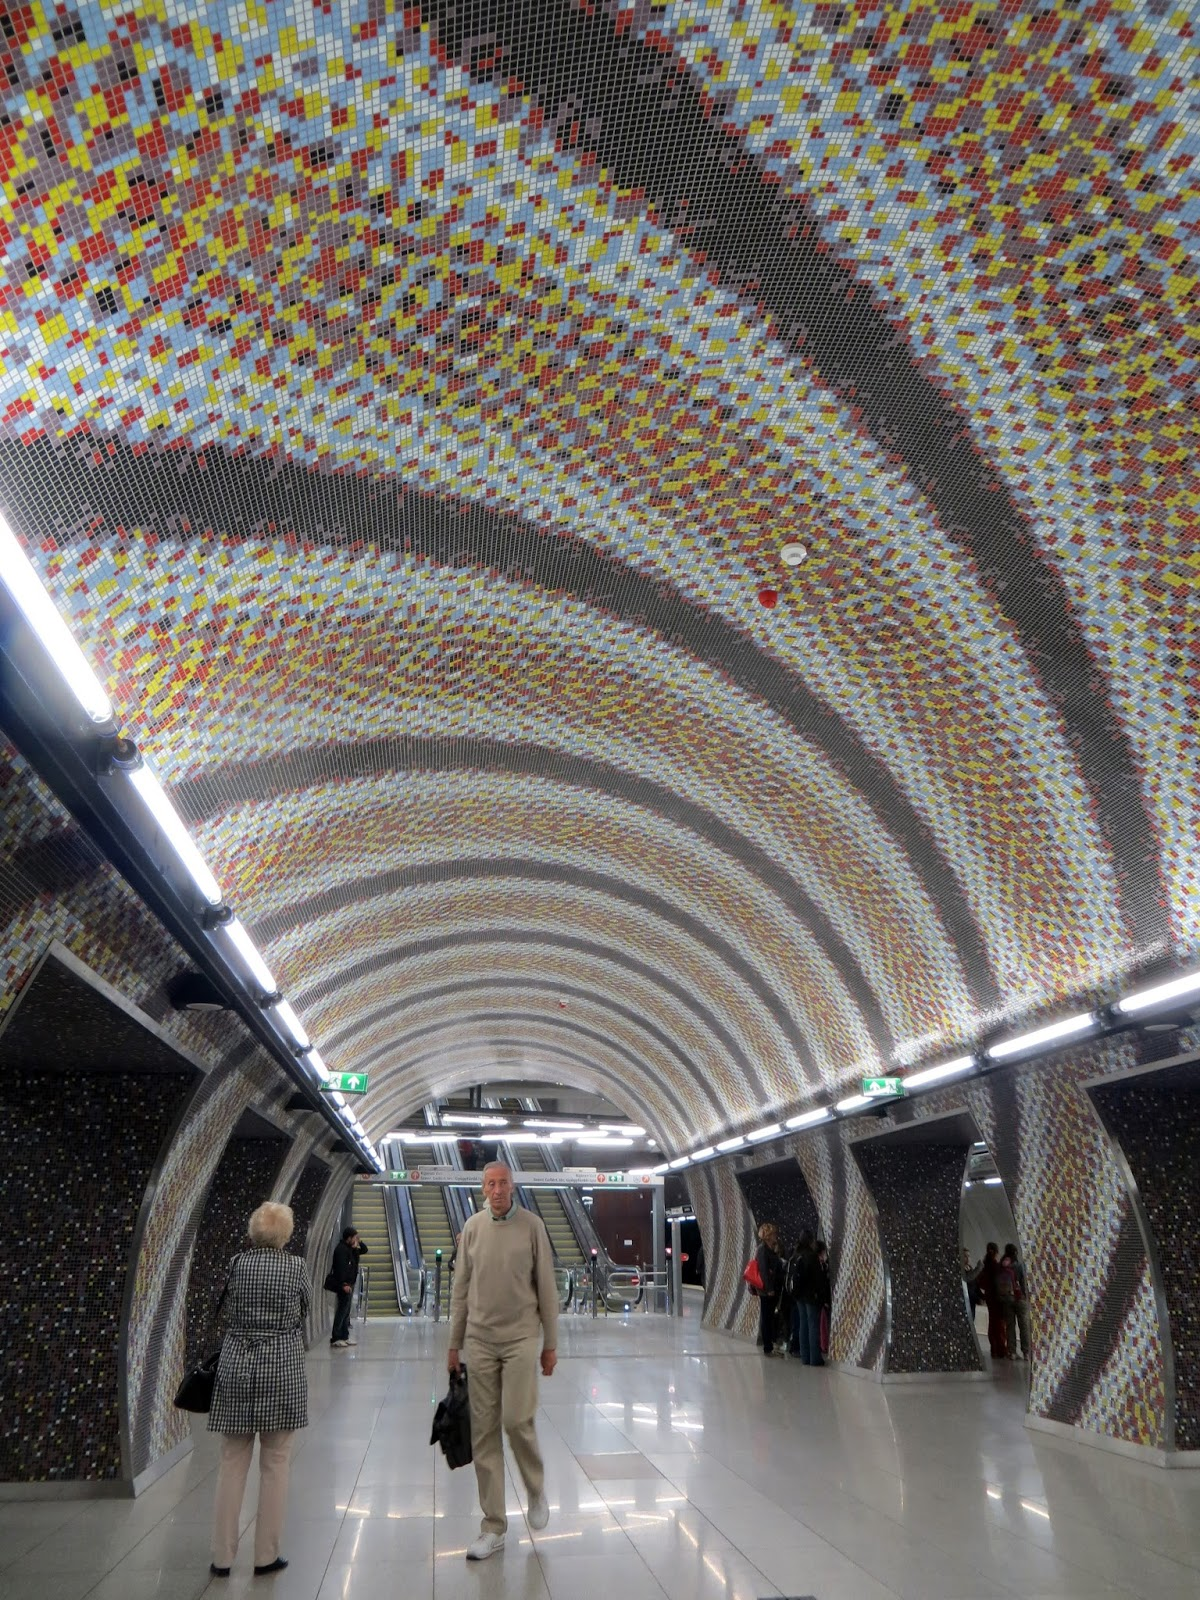 Budapest, photography, night time, architecture, travel, blog, adventure, exploration, metro 4